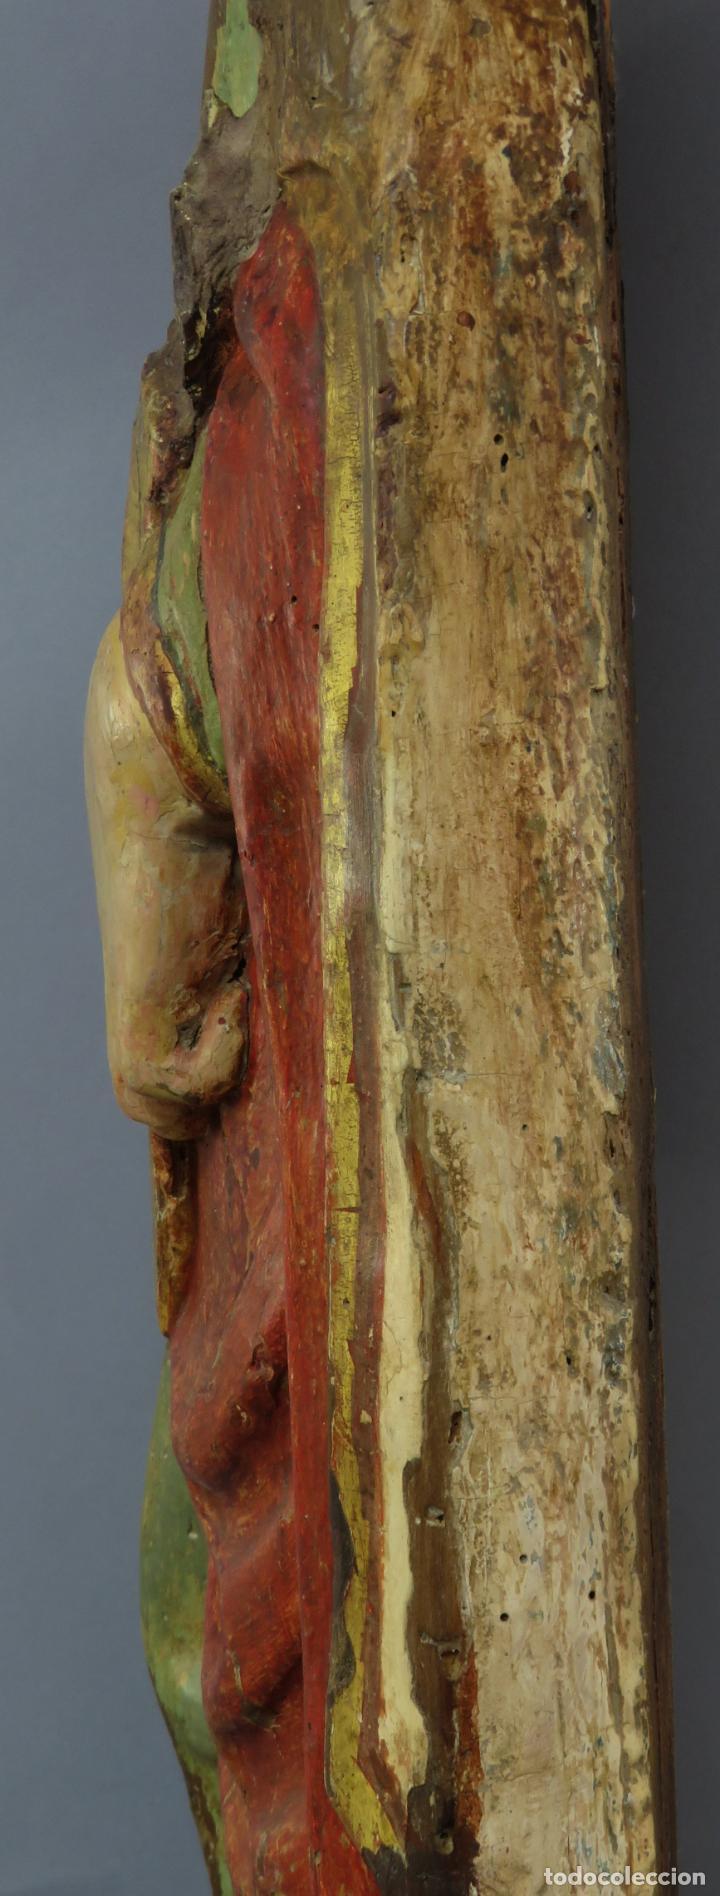 Arte: Talla de medio bulto o chuleta San Juan Evangelista madera tallada dorada y policromada XVI XVII - Foto 22 - 221922775